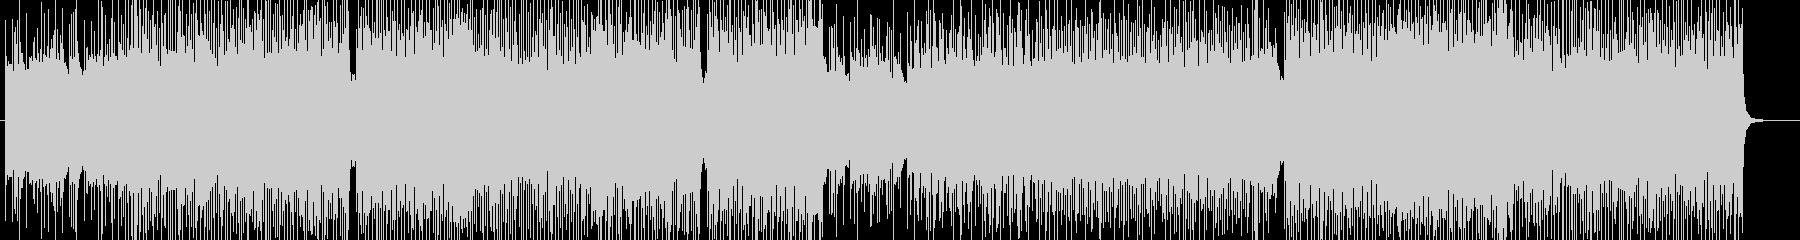 「HR/HM」「DARK」BGM176の未再生の波形